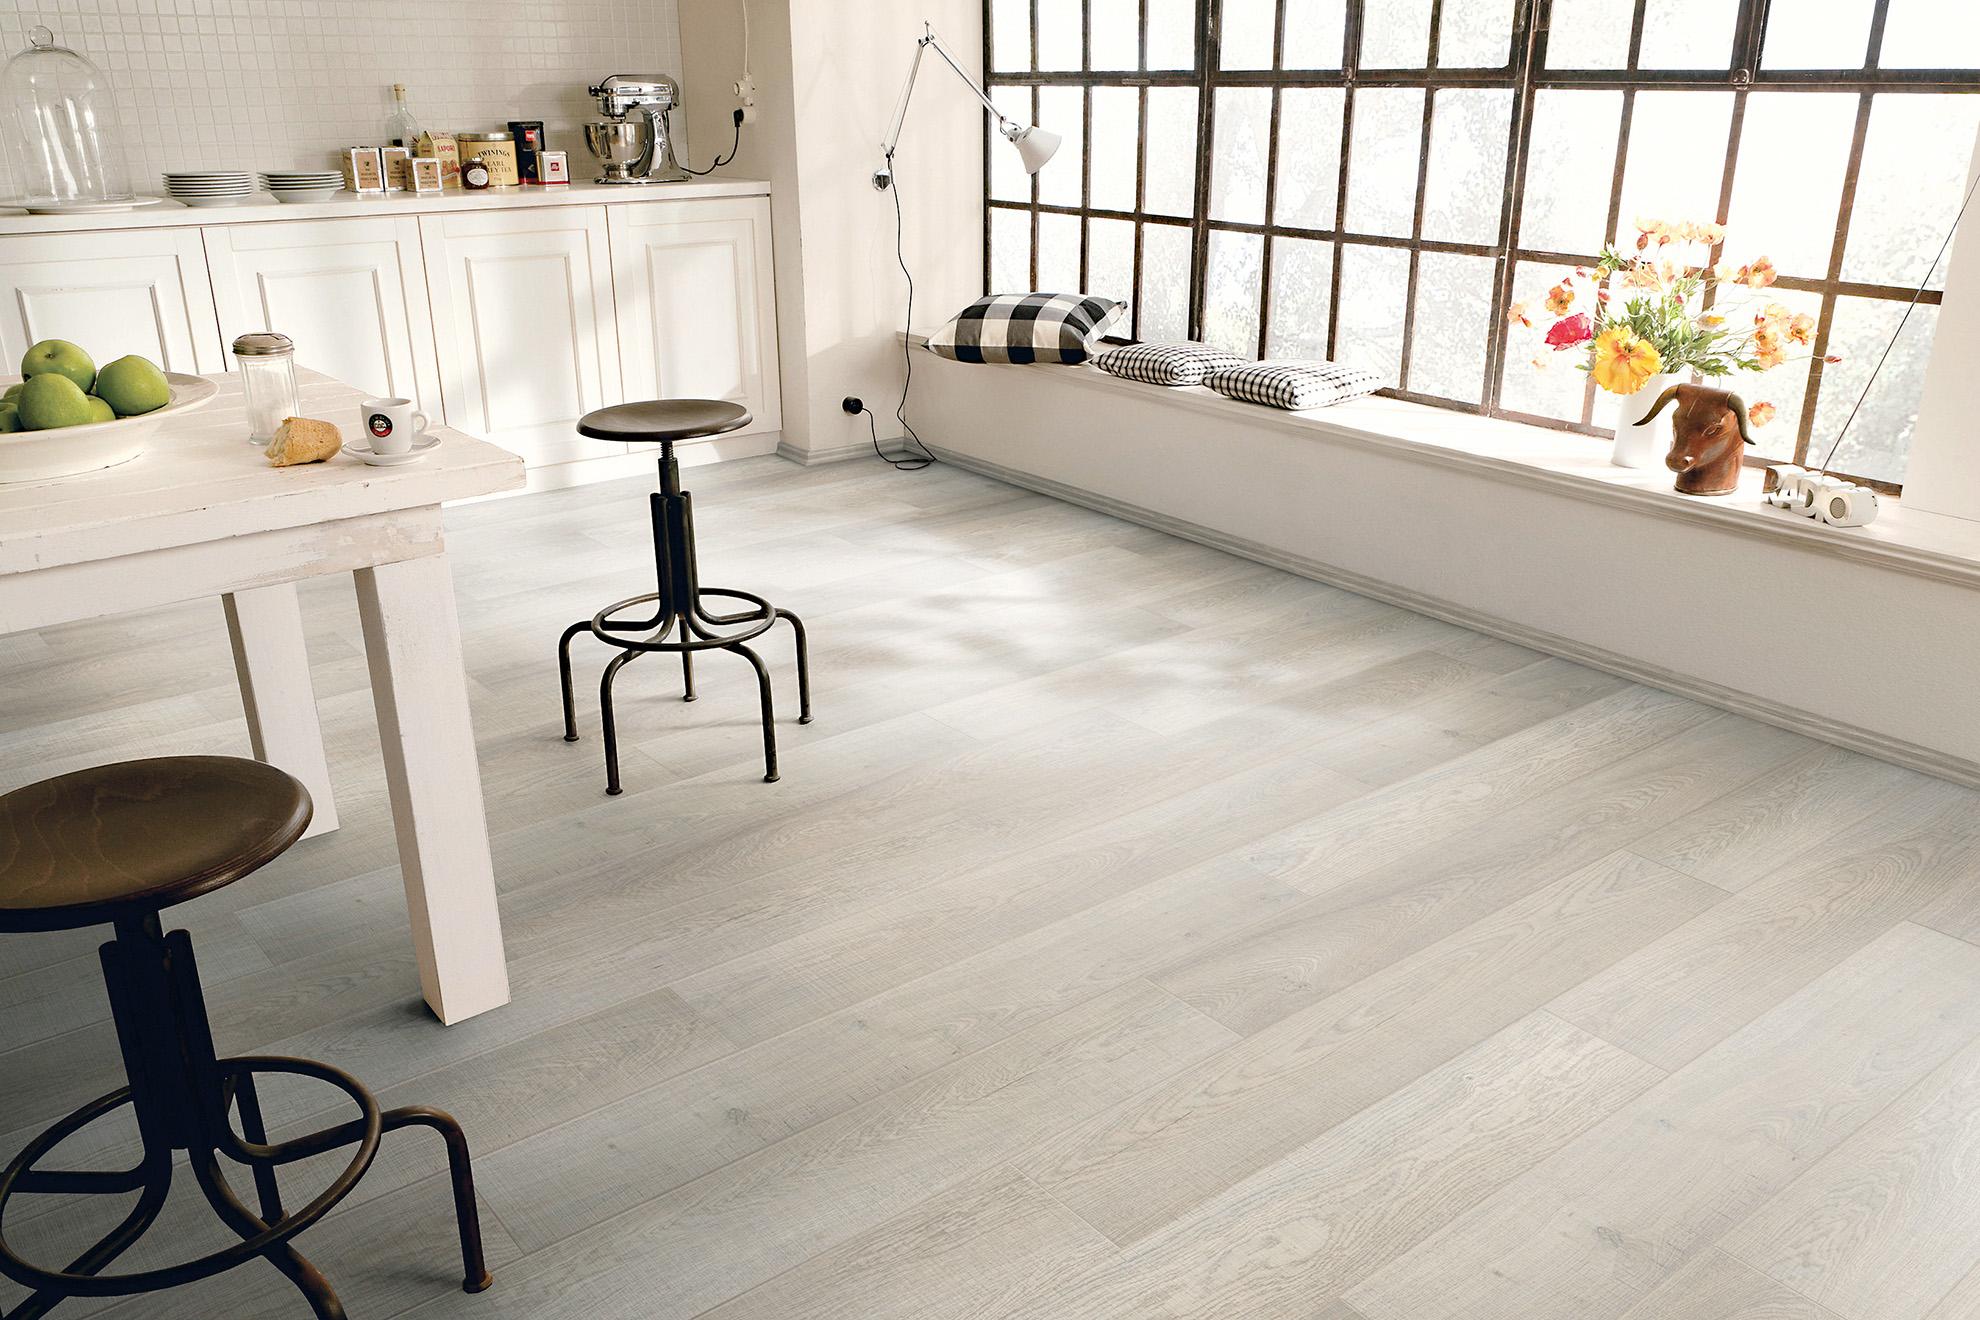 Tile flooring cost calculator